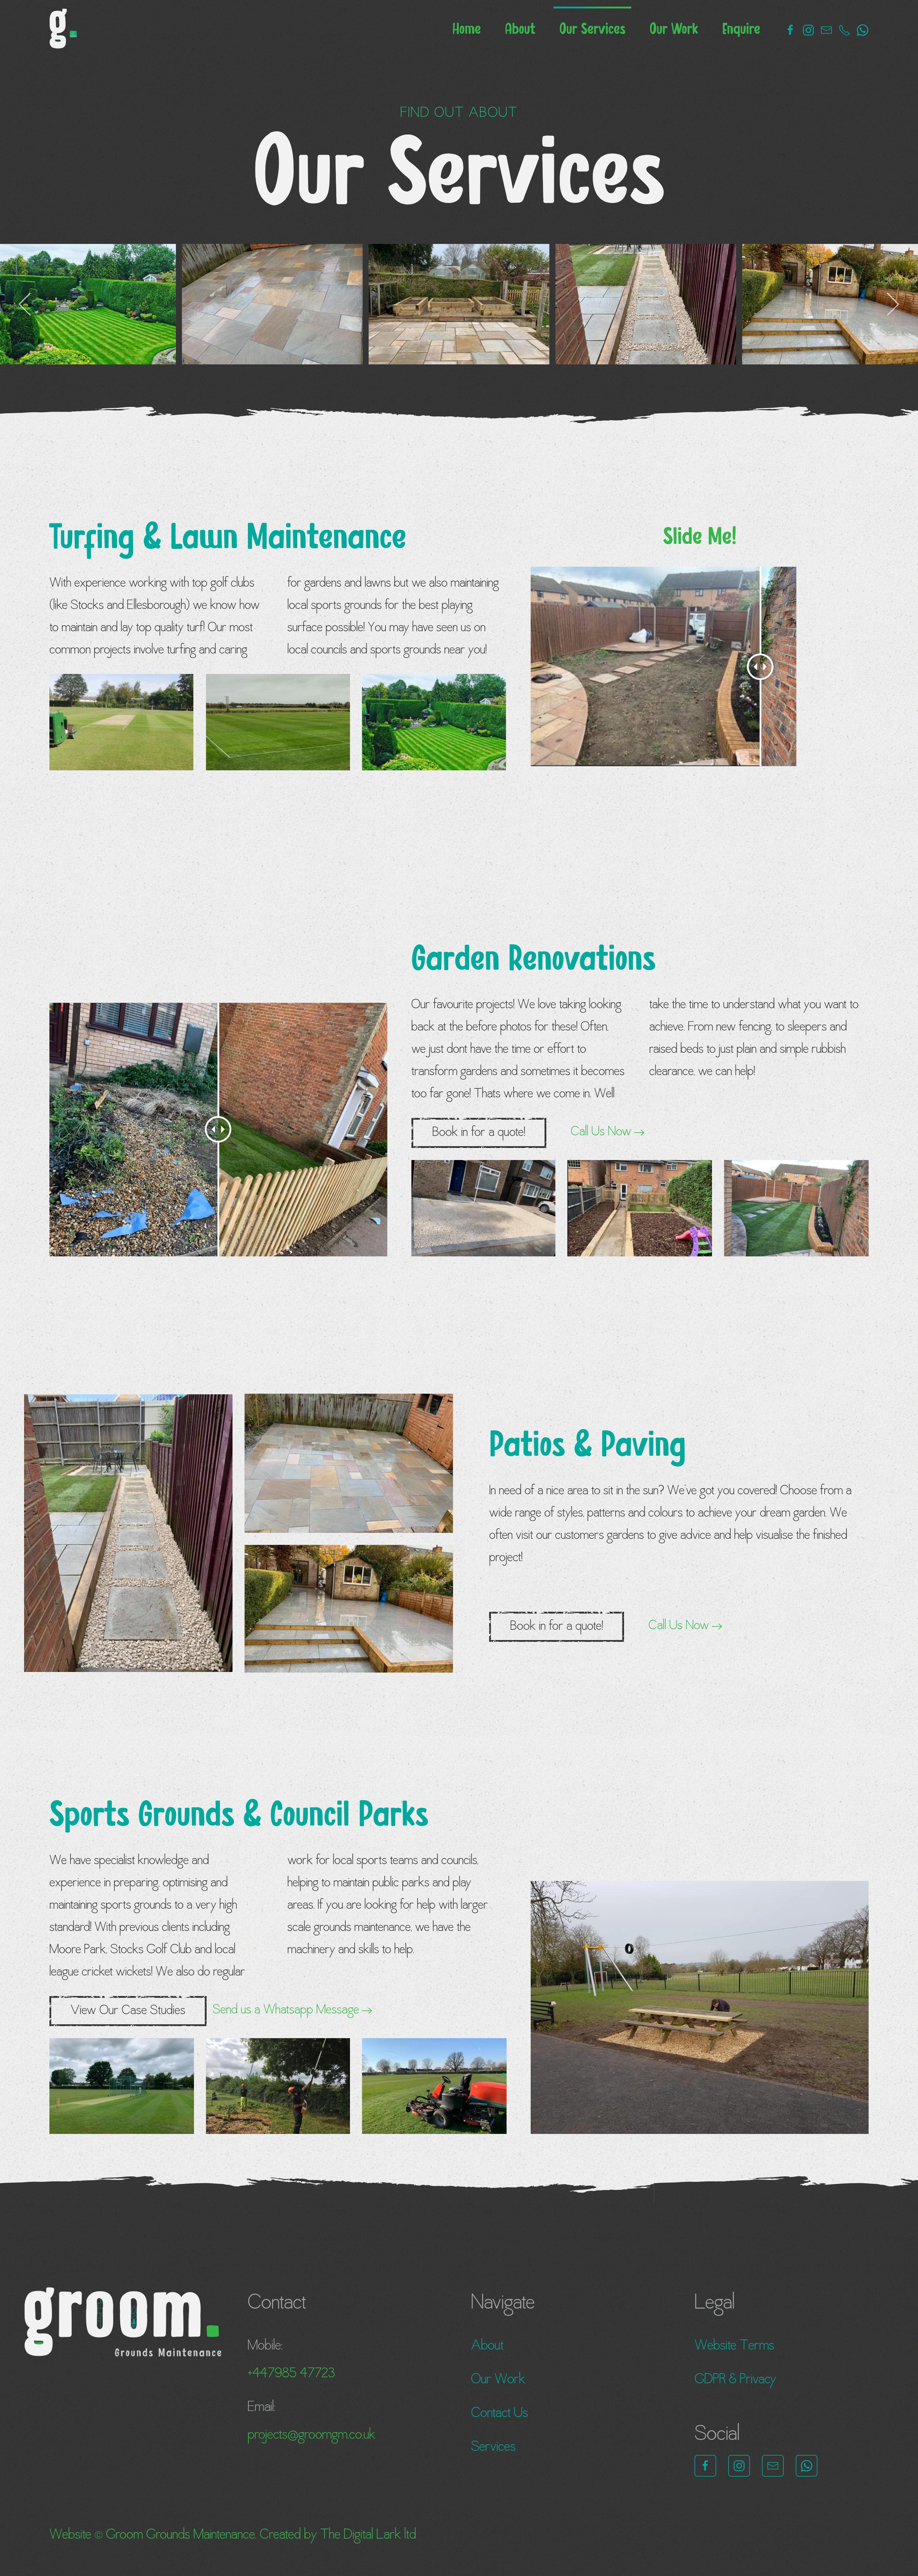 Groom Grounds Maintenance Website